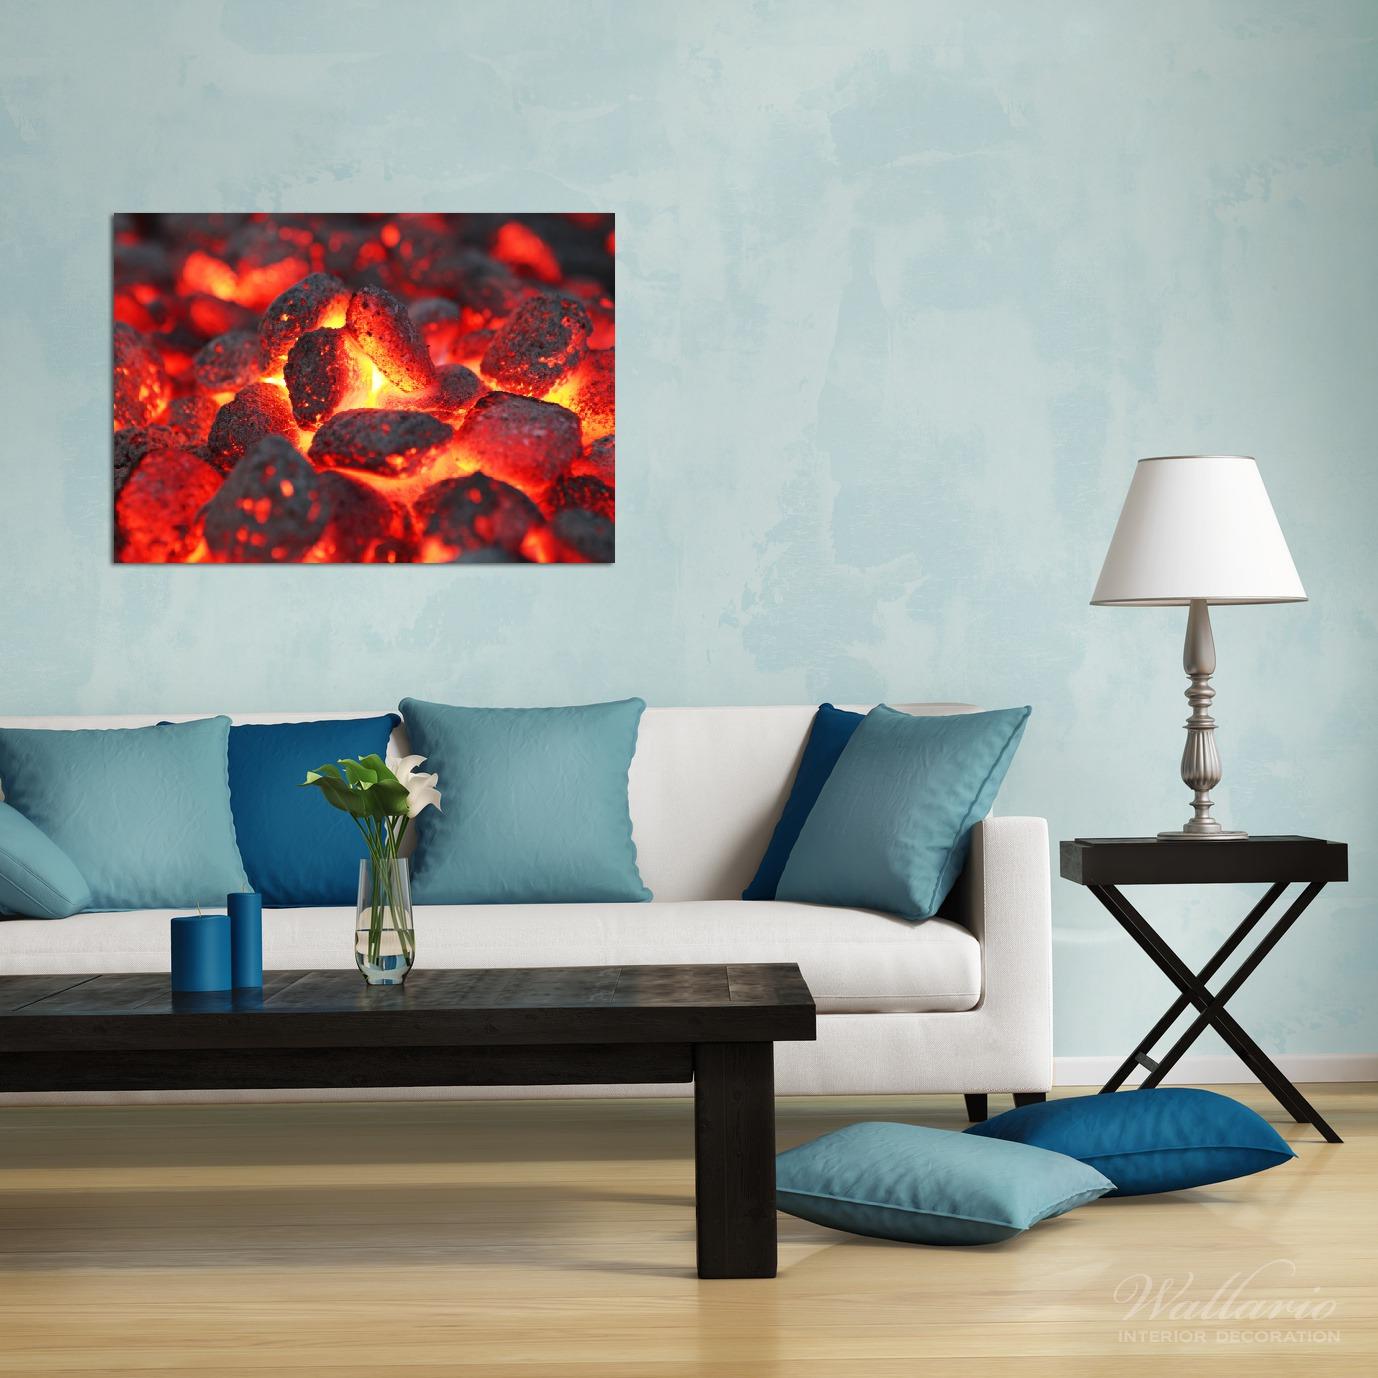 Wandbild Glühende Kohlen im Kamin – Bild 2